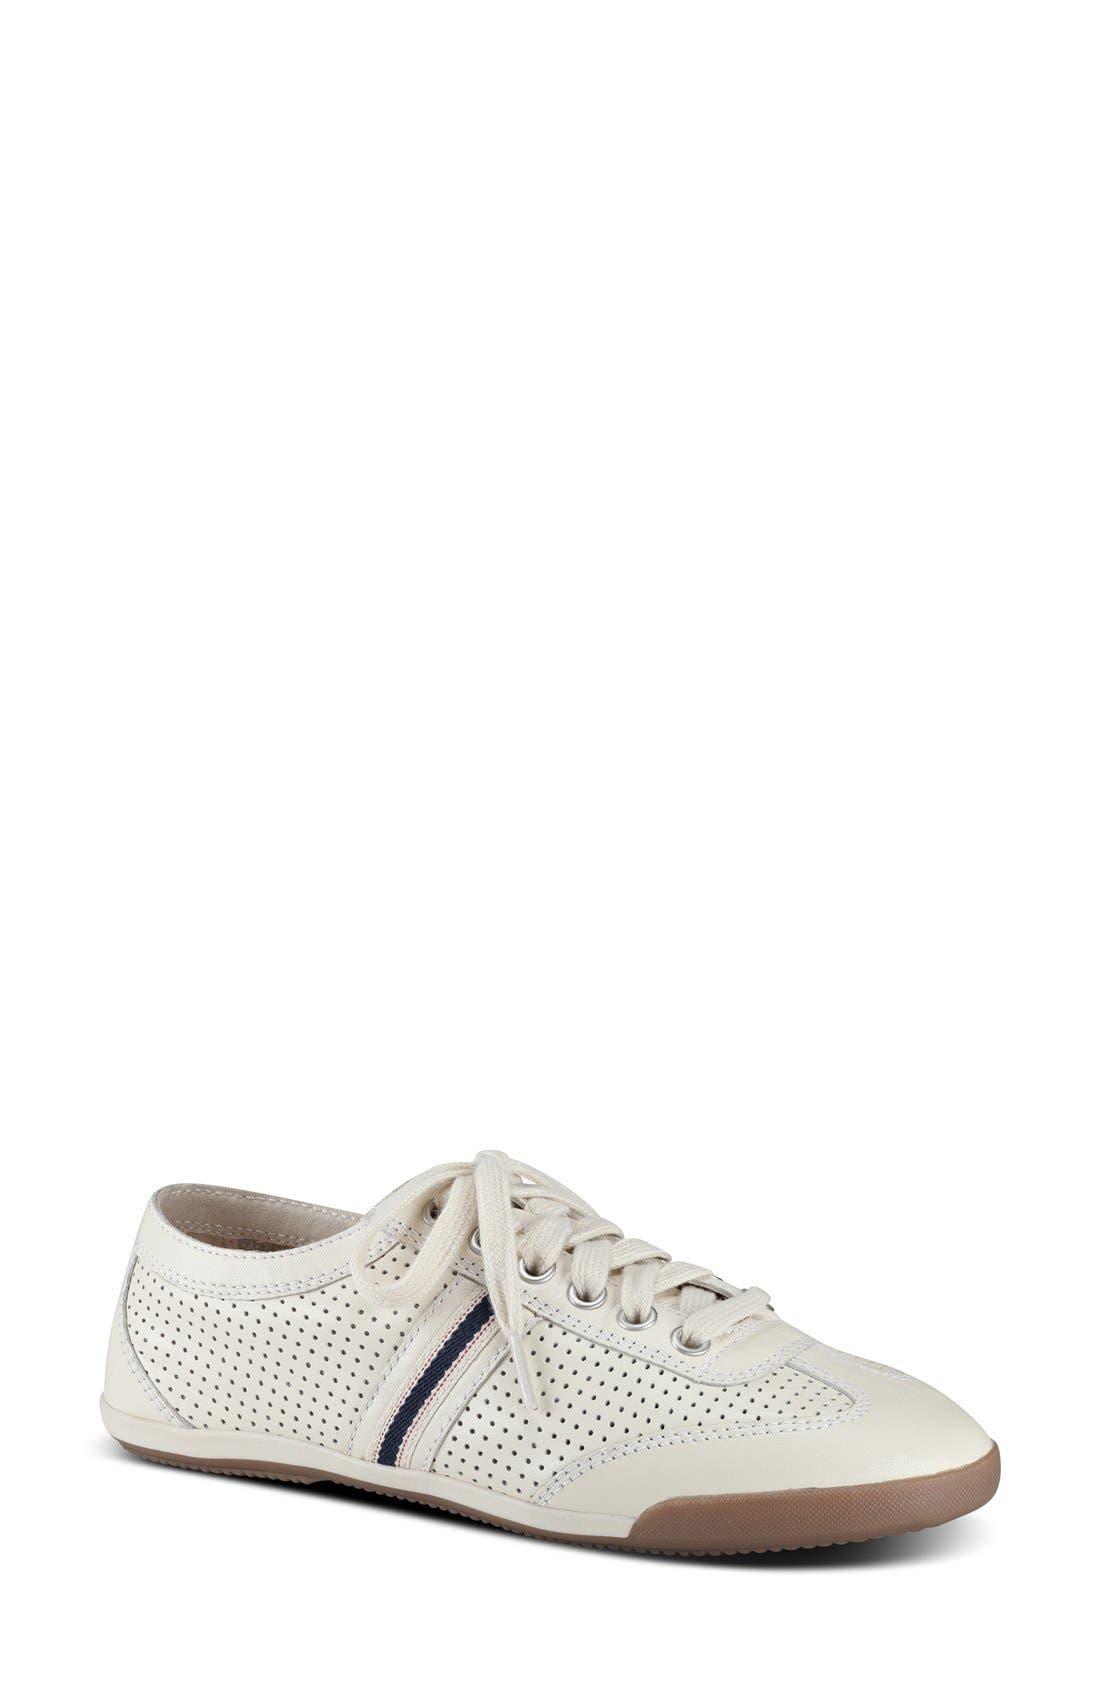 'Escondido' Sneaker,                         Main,                         color, 110